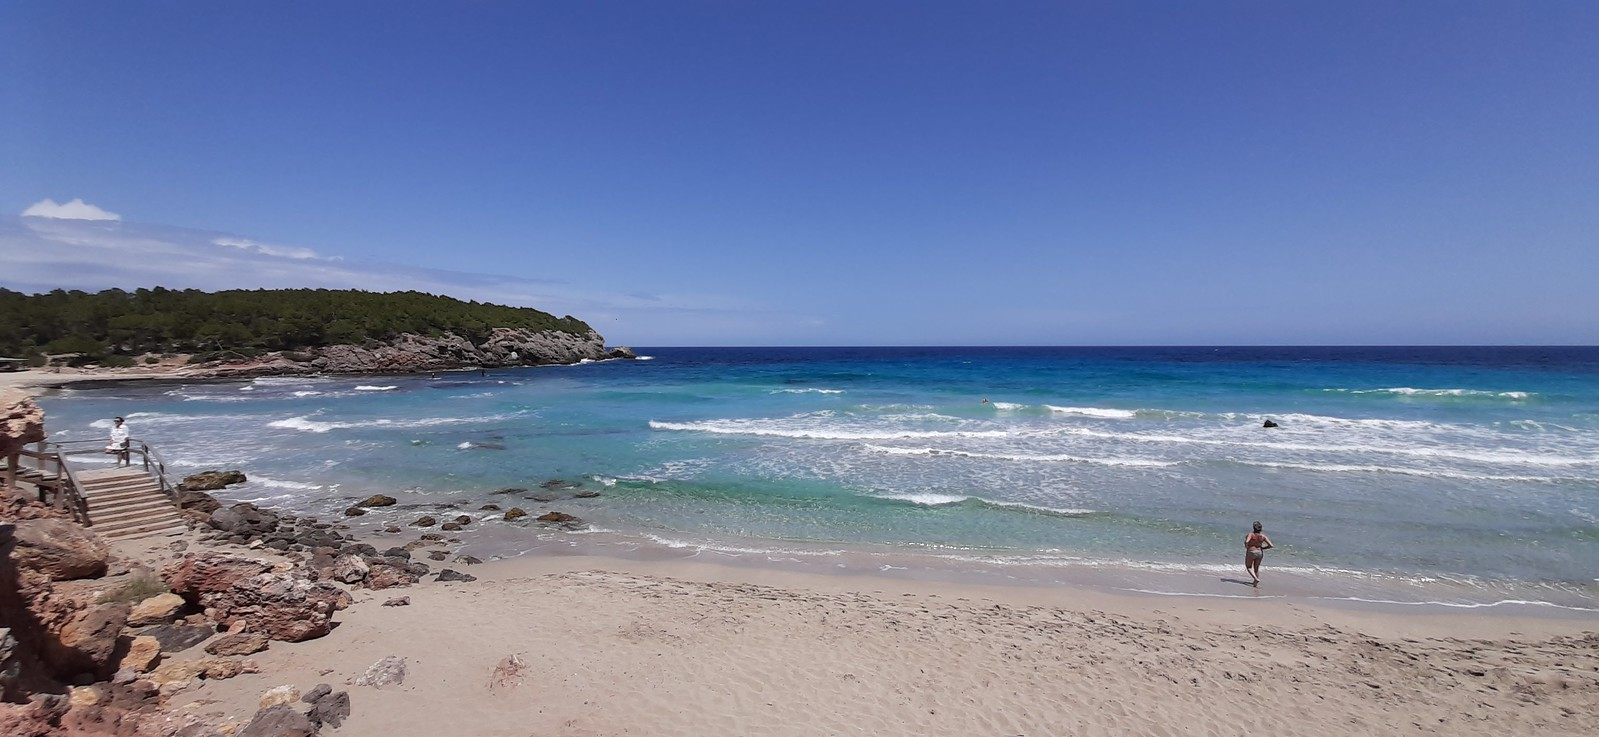 Cala Nova, Ibiza, 28 de mayo 2021